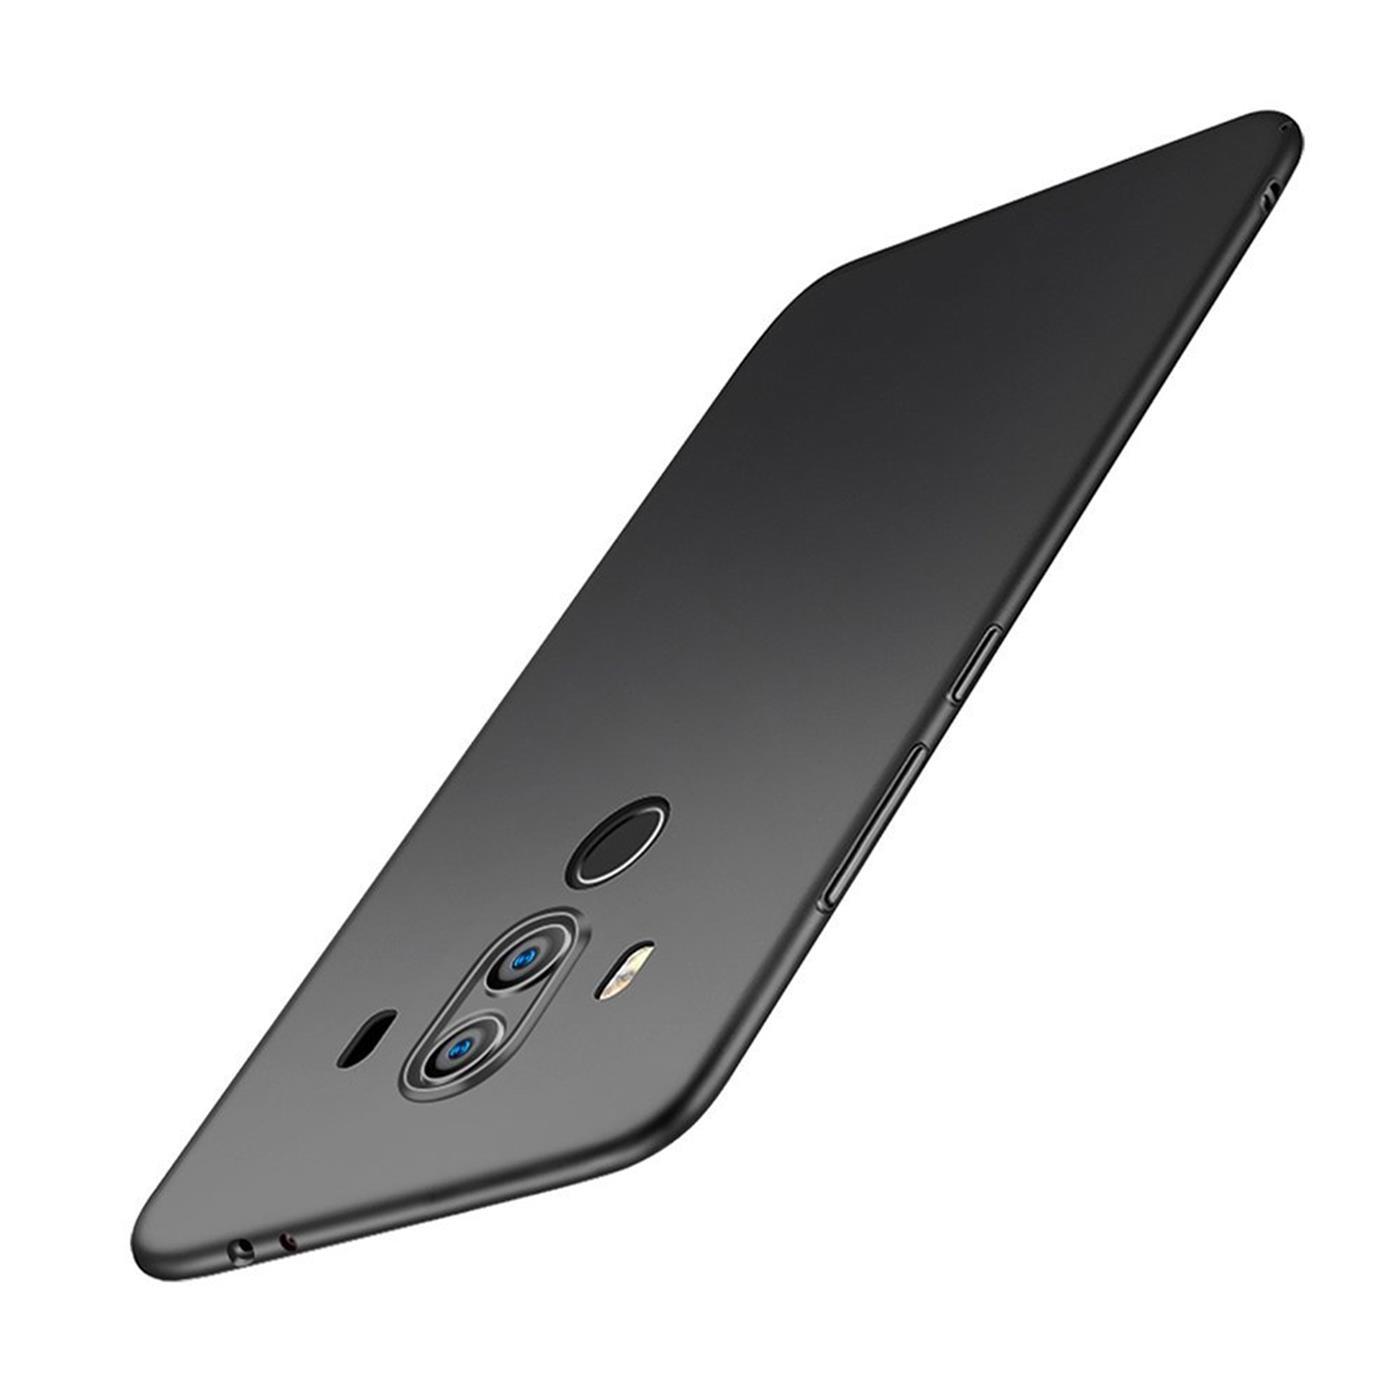 Silikonhülle Huawei Honor TPU Case Bumper Cover Silikon Handy Tasche Schwarz